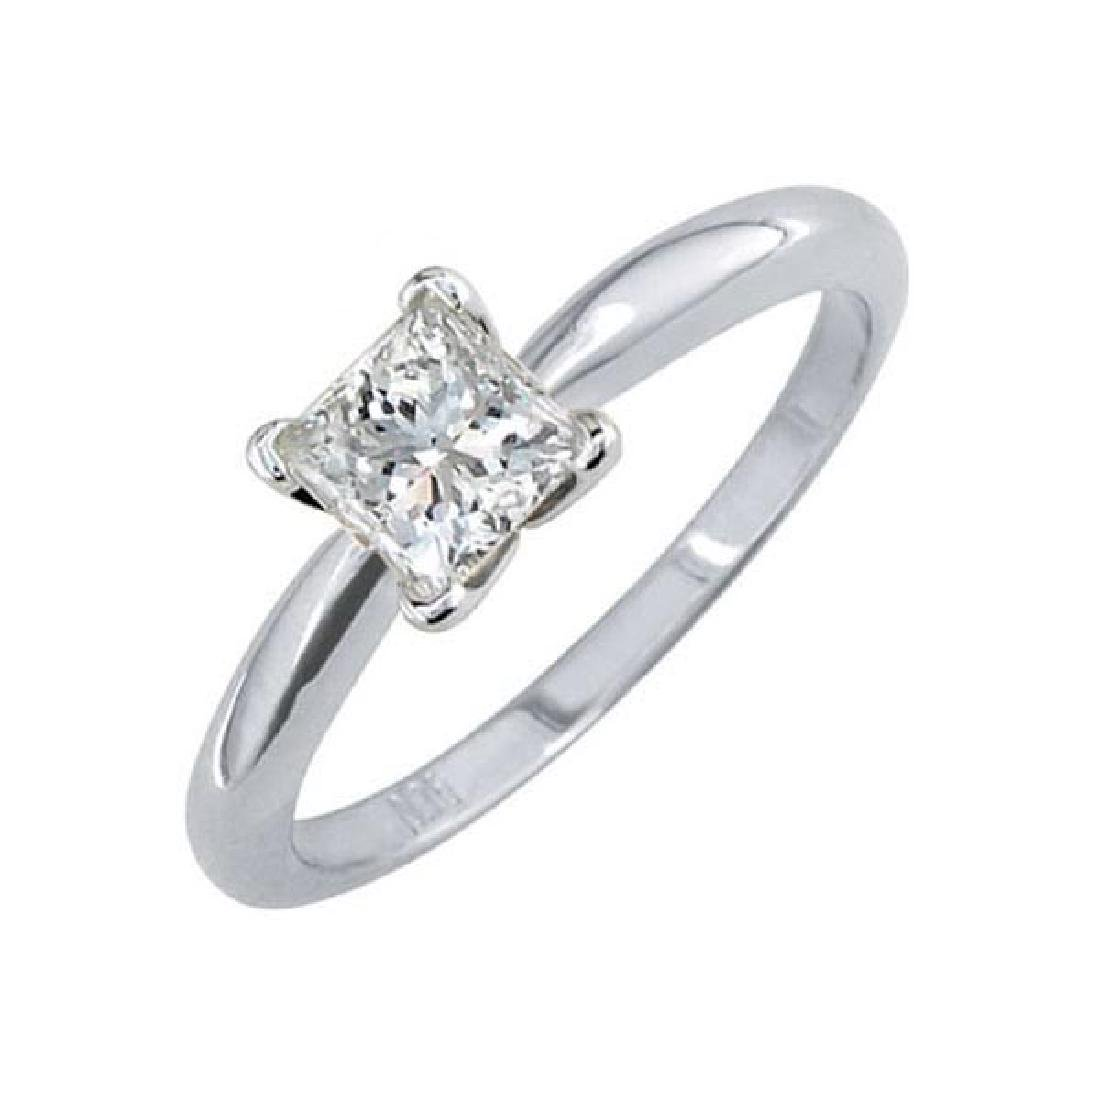 Certified 1.17 CTW Princess Diamond Solitaire 14k Ring